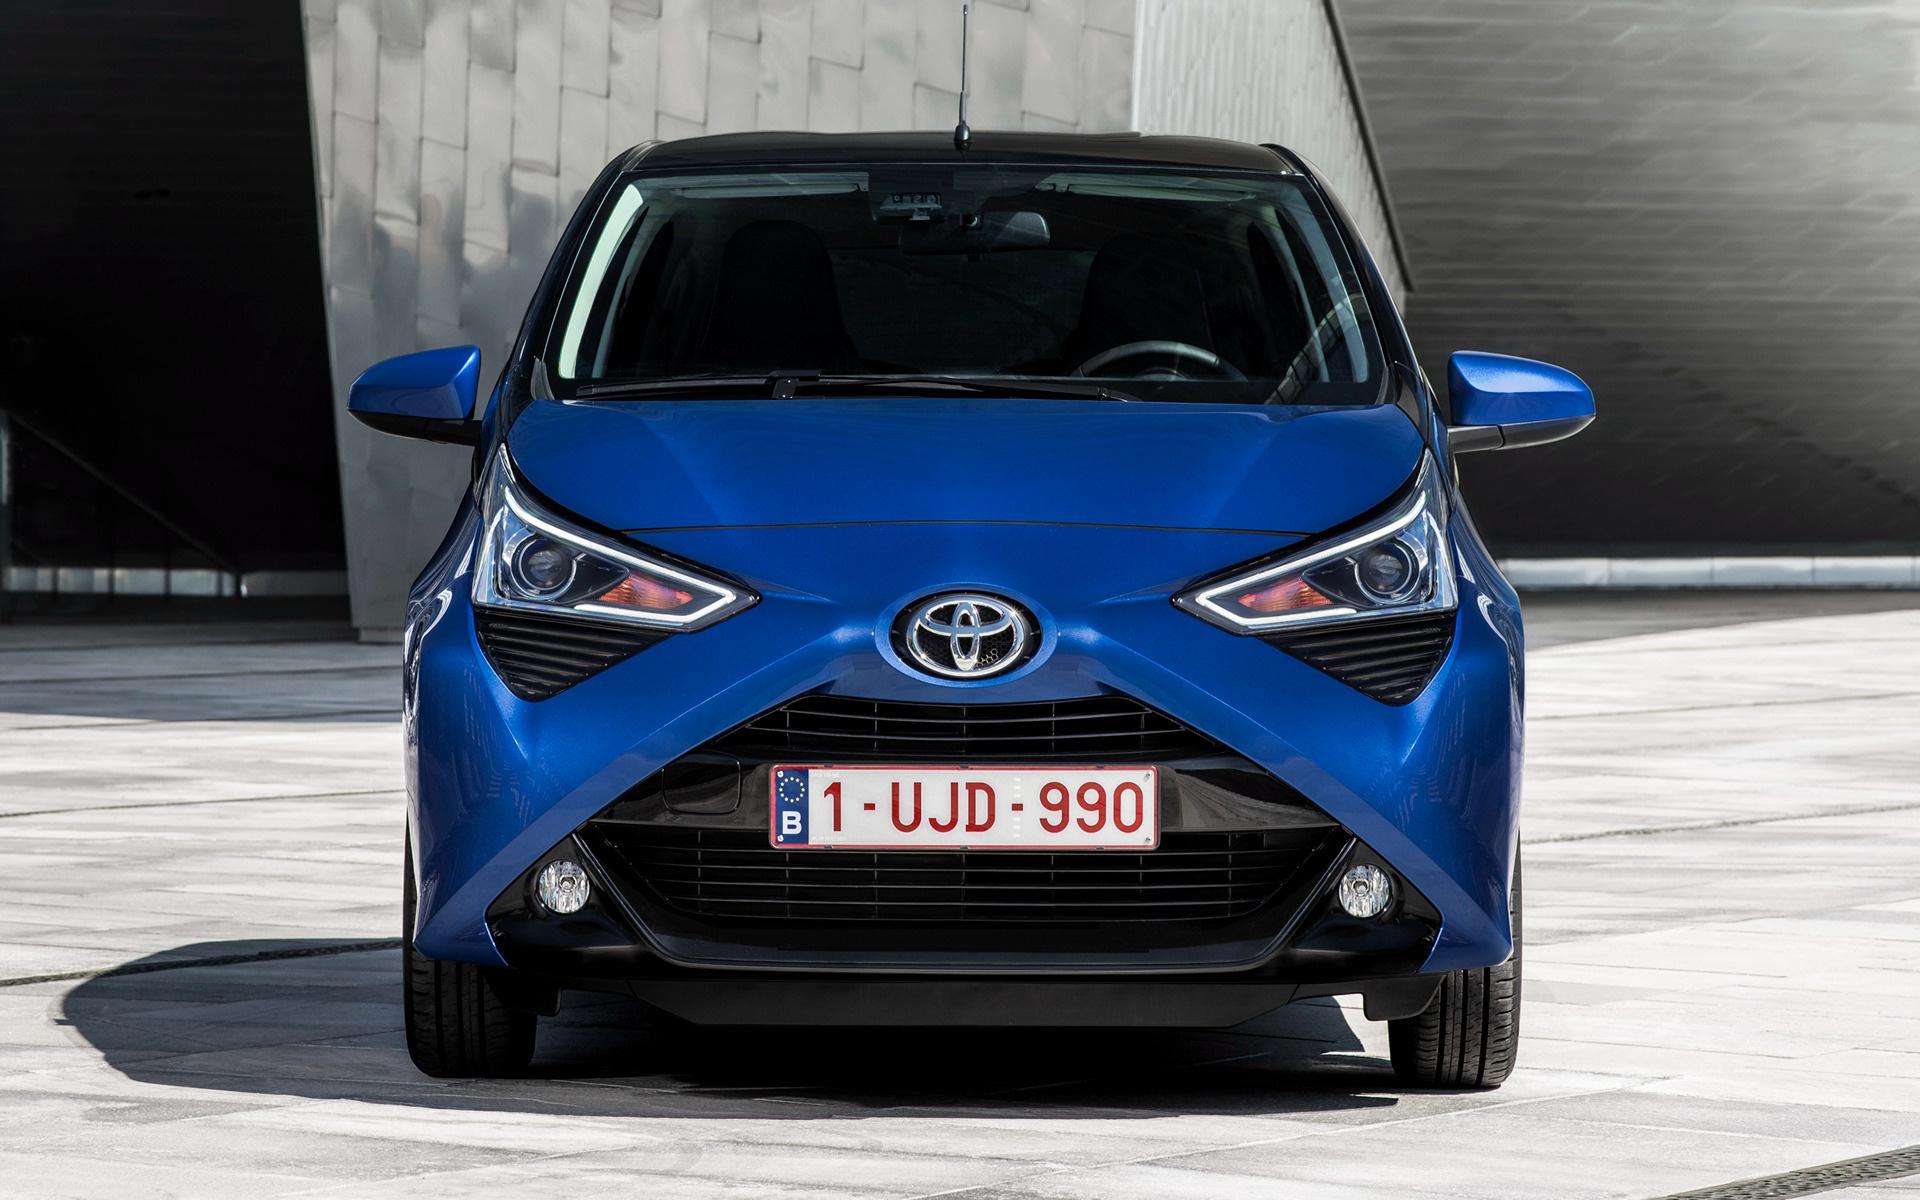 2018 Toyota Aygo 5 door   Wallpapers and HD Images Car Pixel 1920x1200